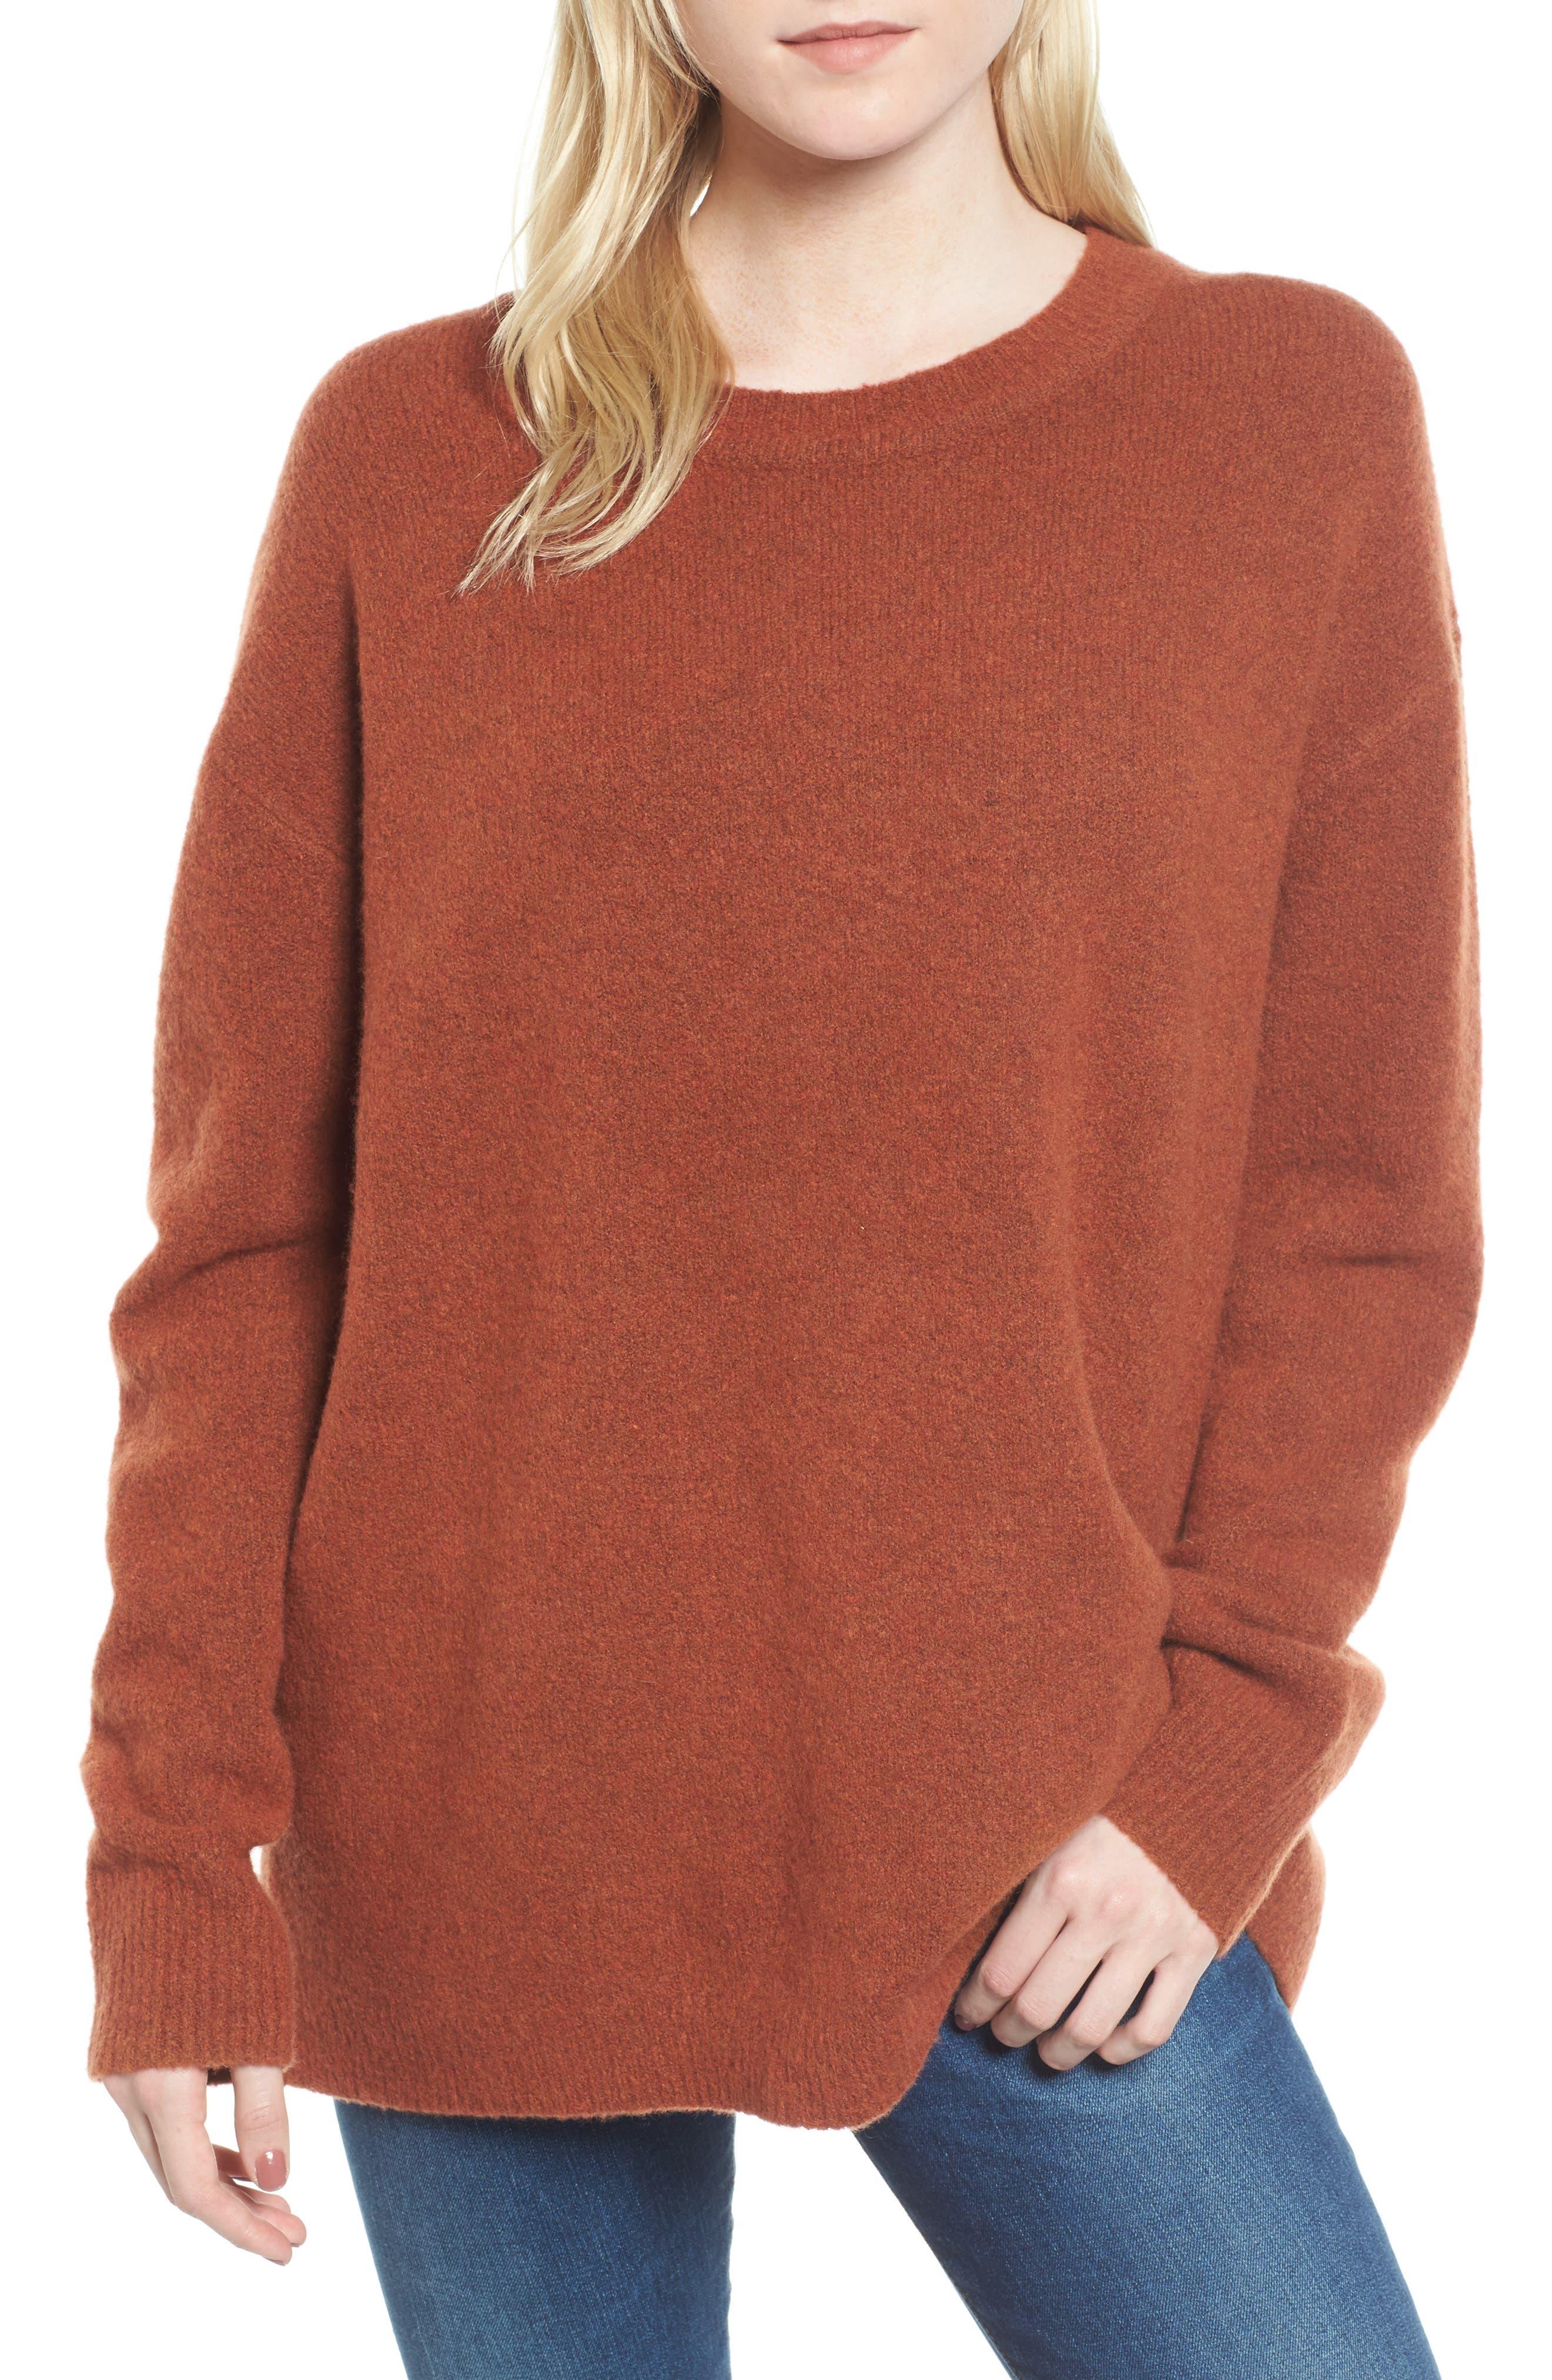 Oversize Cashmere Sweater,                             Main thumbnail 1, color,                             806